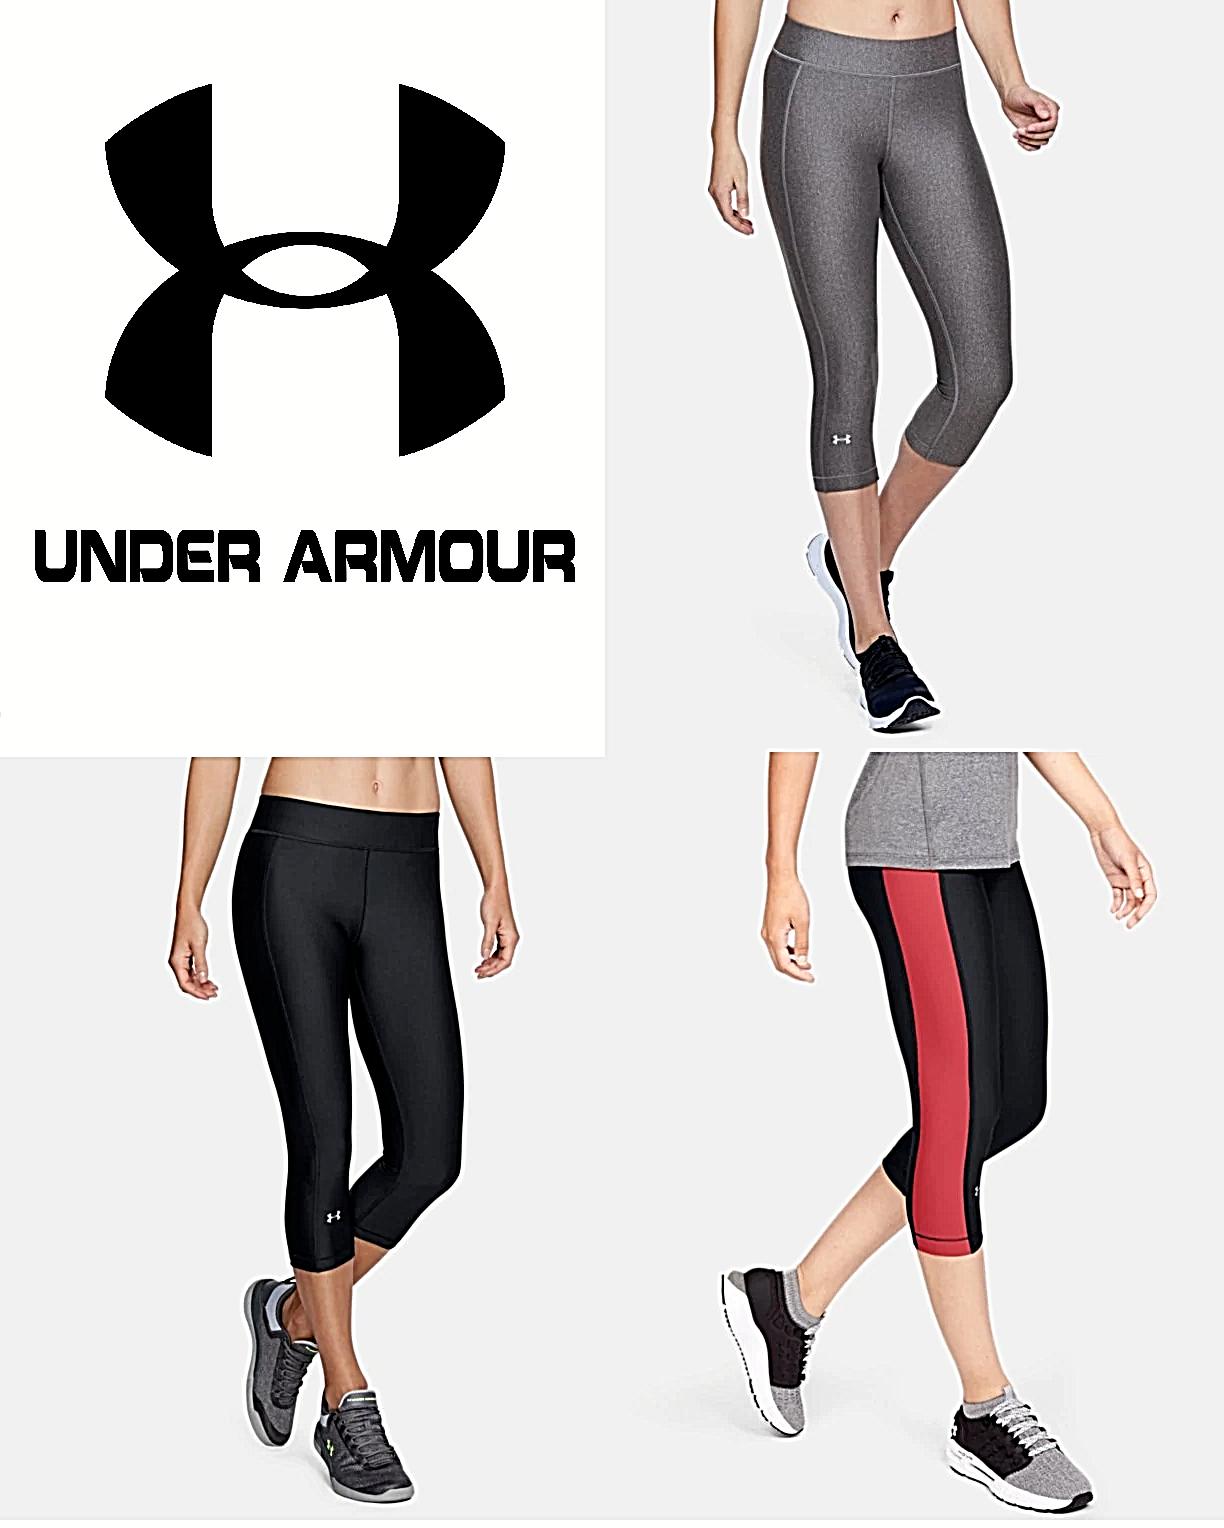 Under Armour Women's Heatgear Capri Stretch Yoga Pants Run W